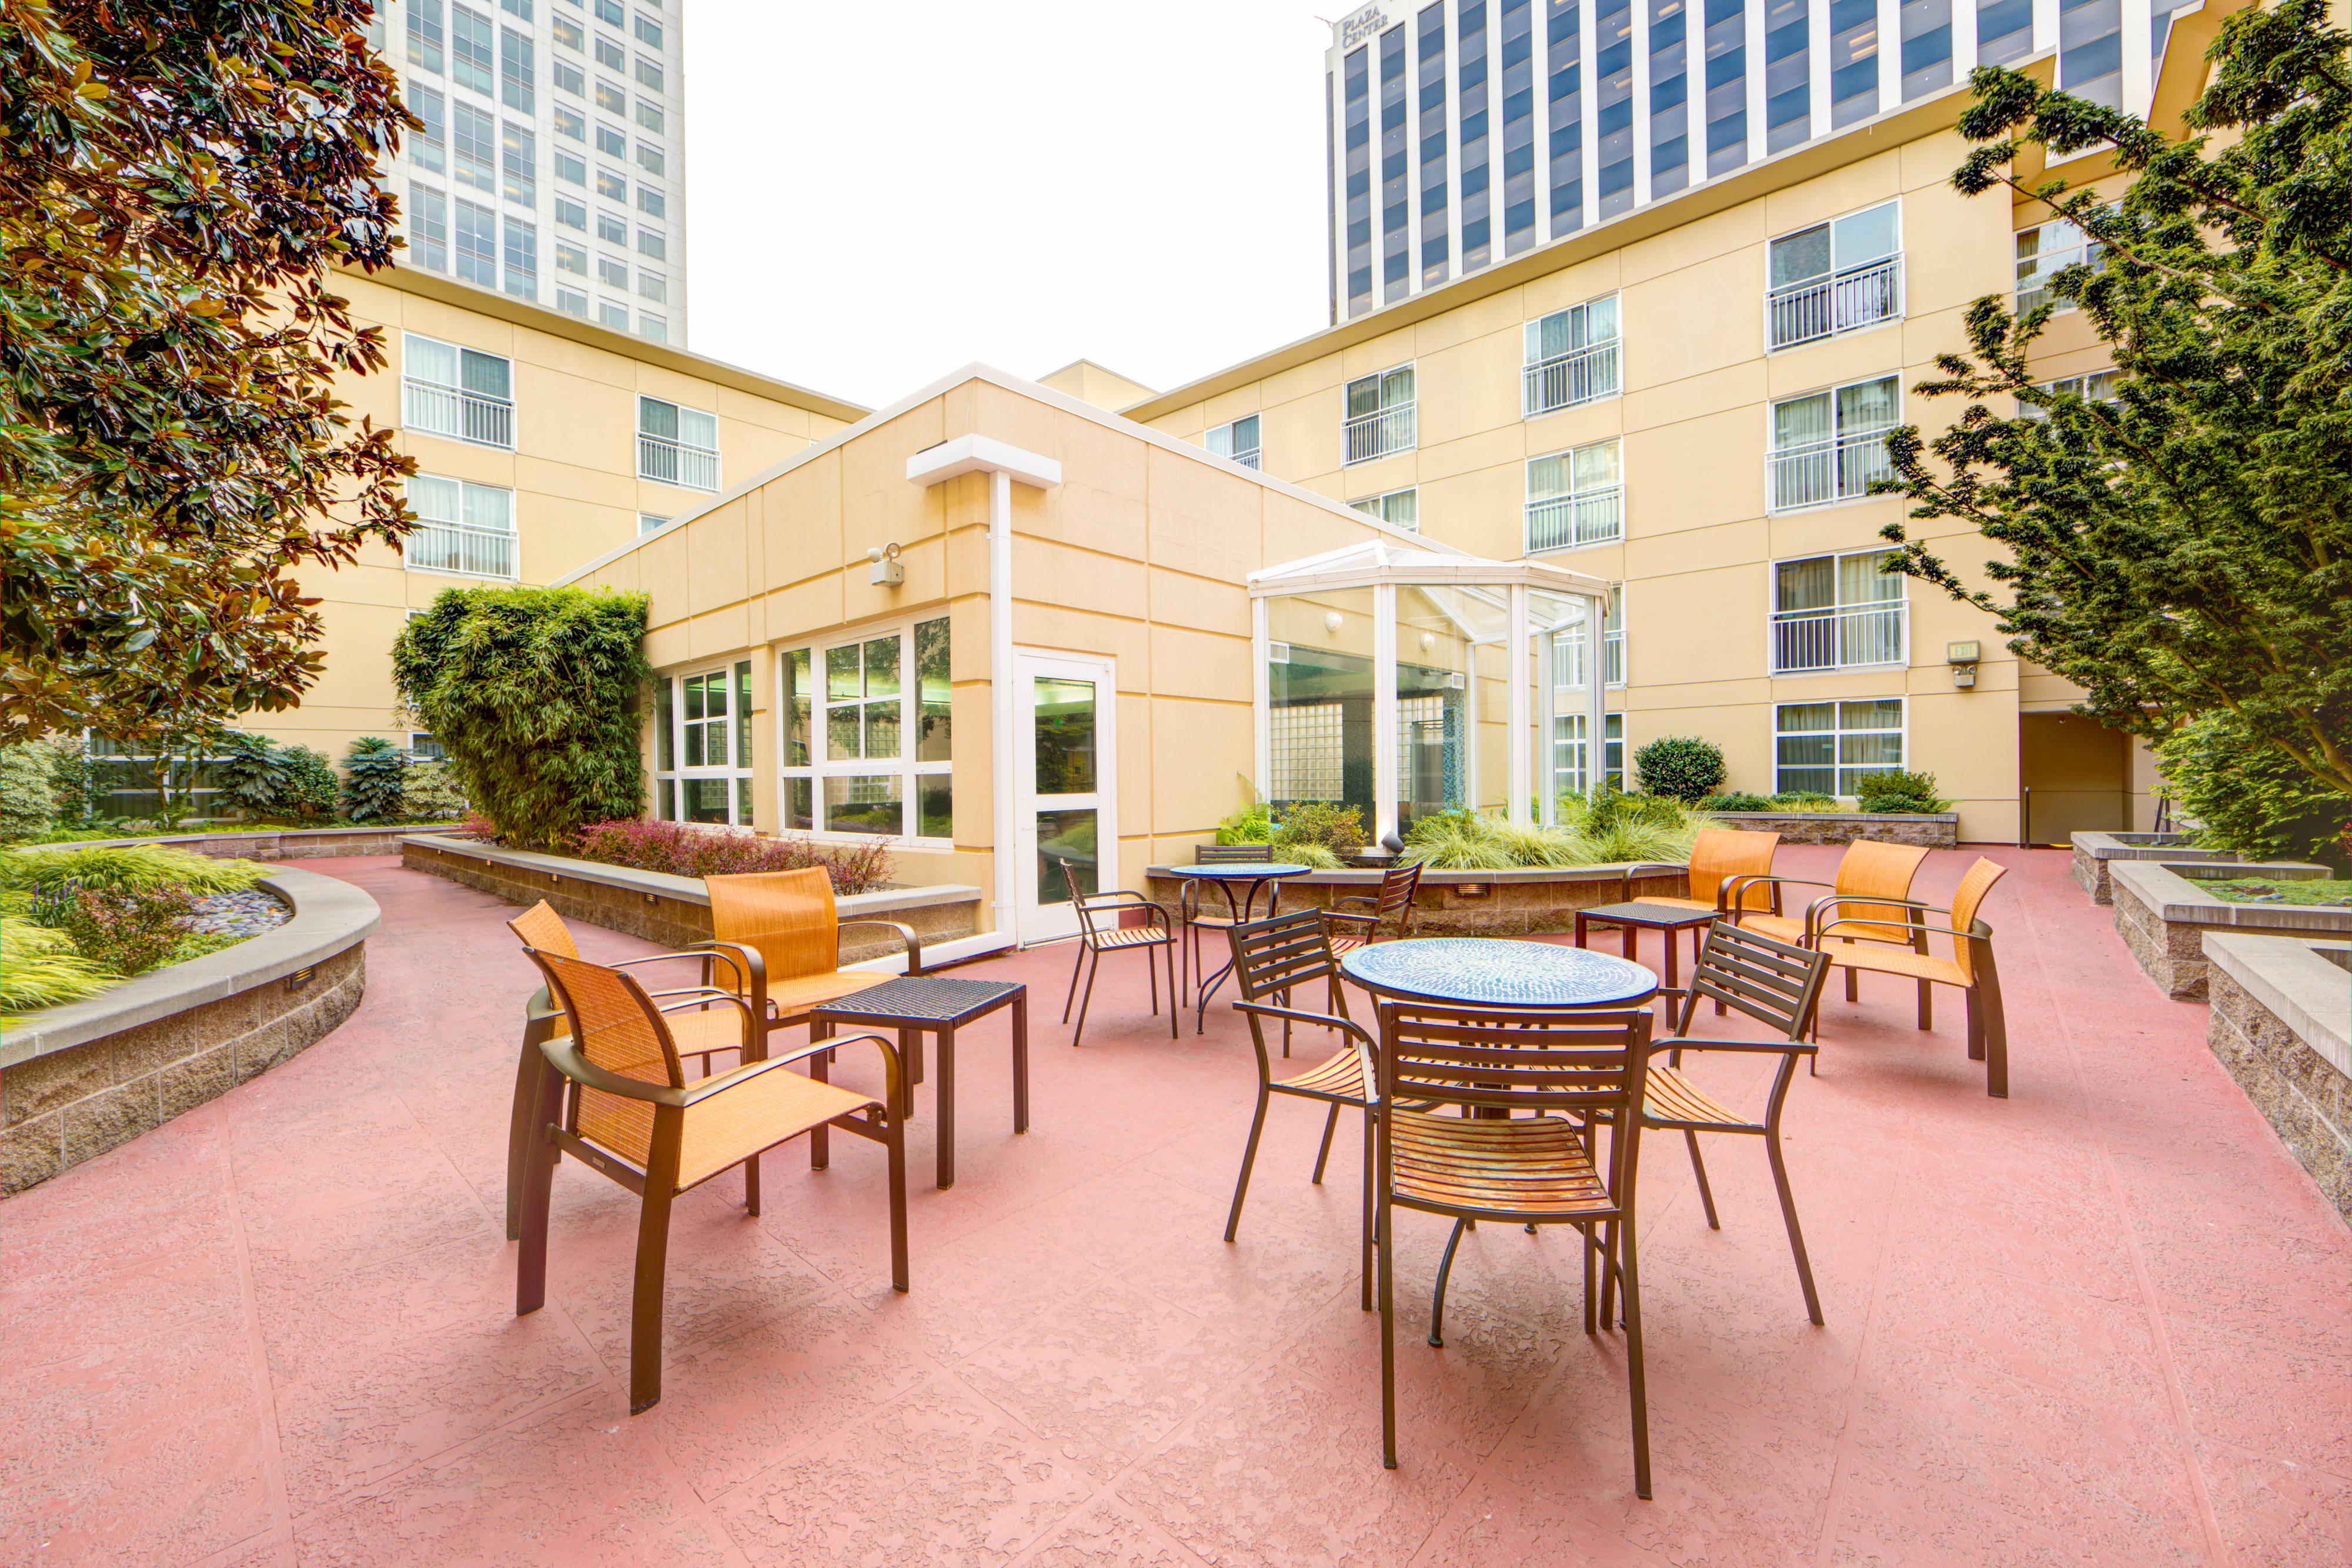 Courtyard By Marriott Bellevue Downtown